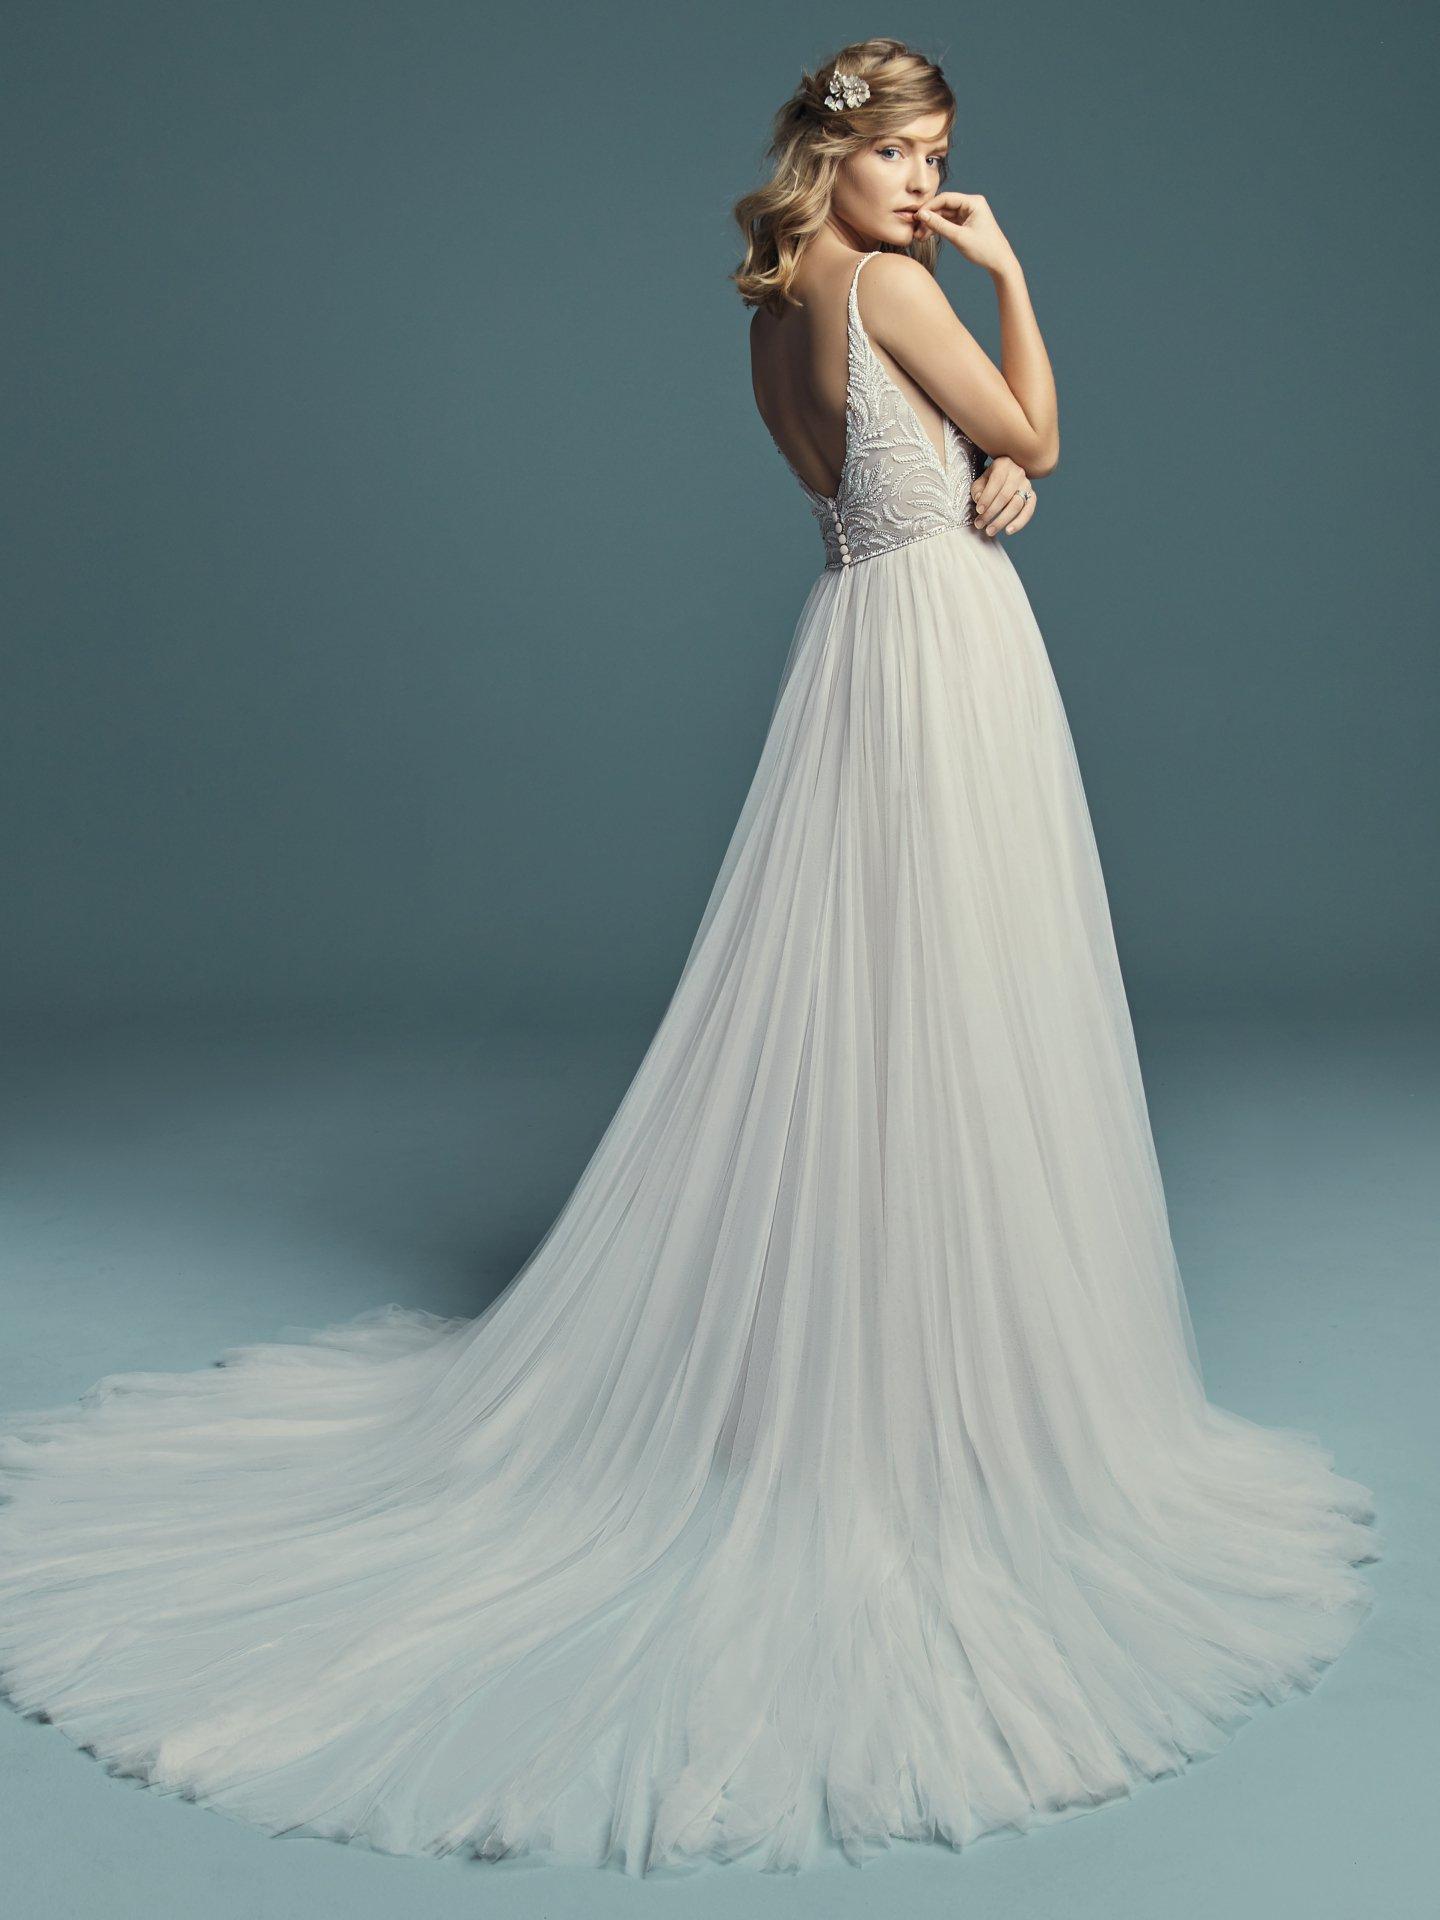 Spaghetti Strap A Line Wedding Dress With V Neckline Beaded Bodice